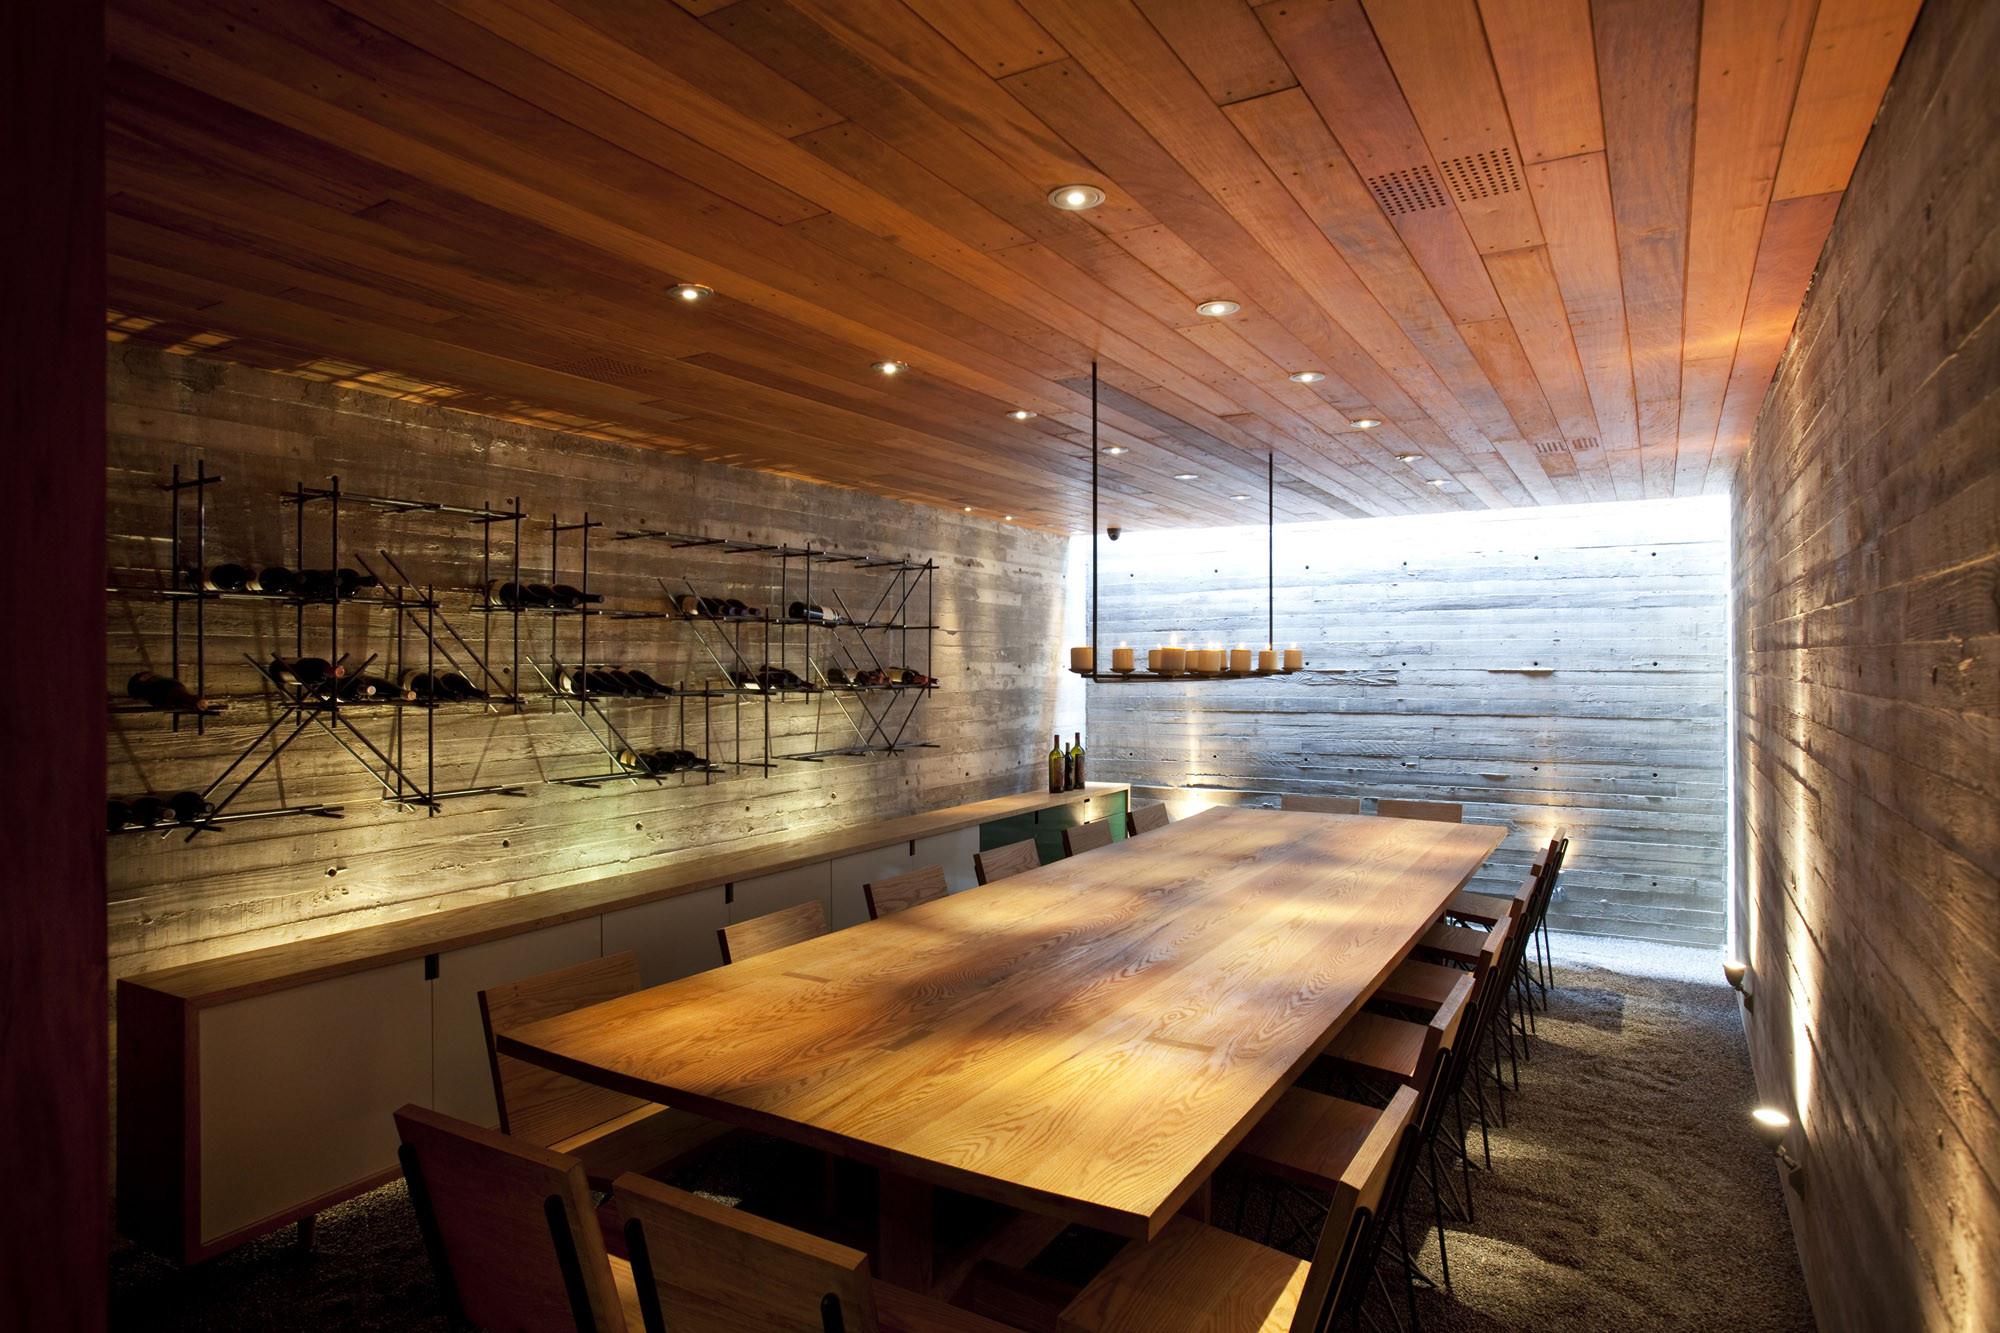 Gallery of culinary art school gracia studio 3 for Arquitectura de interiores universidades